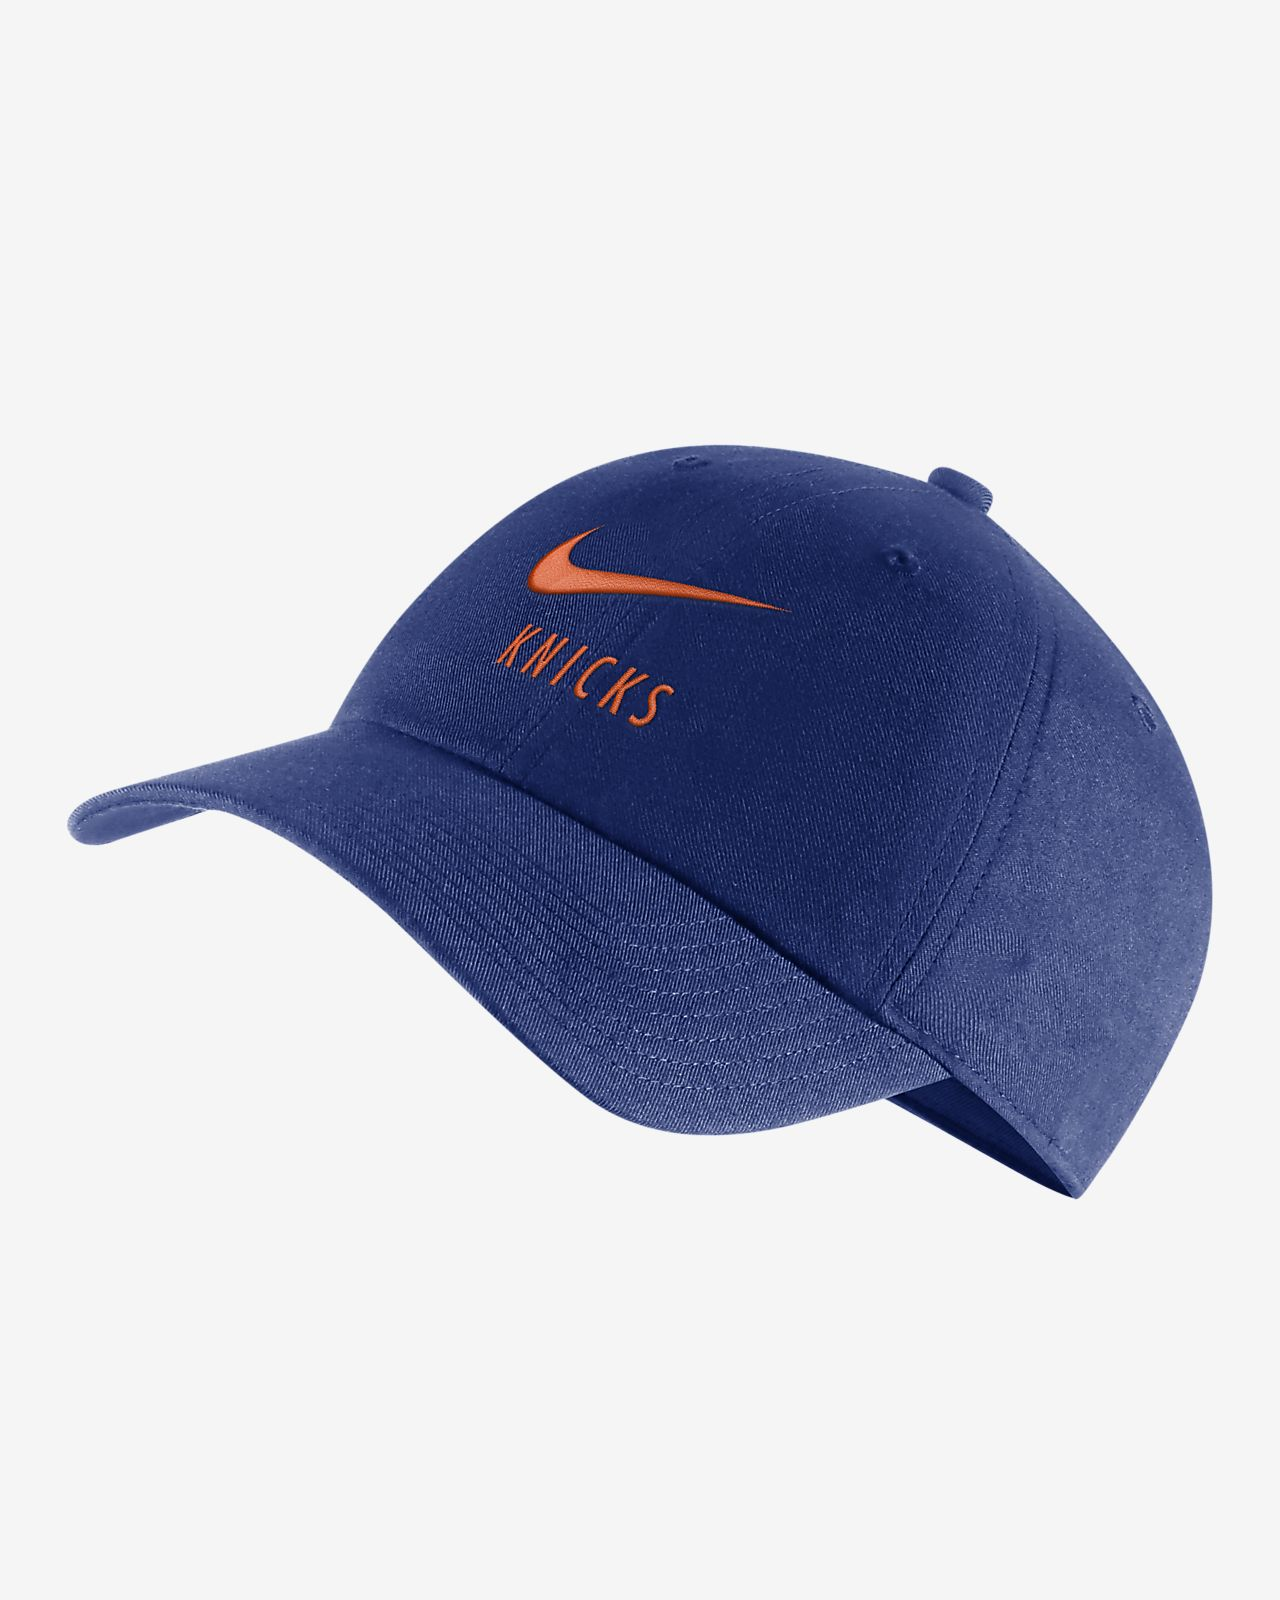 New York Knicks Nike Heritage 86 NBA Cap